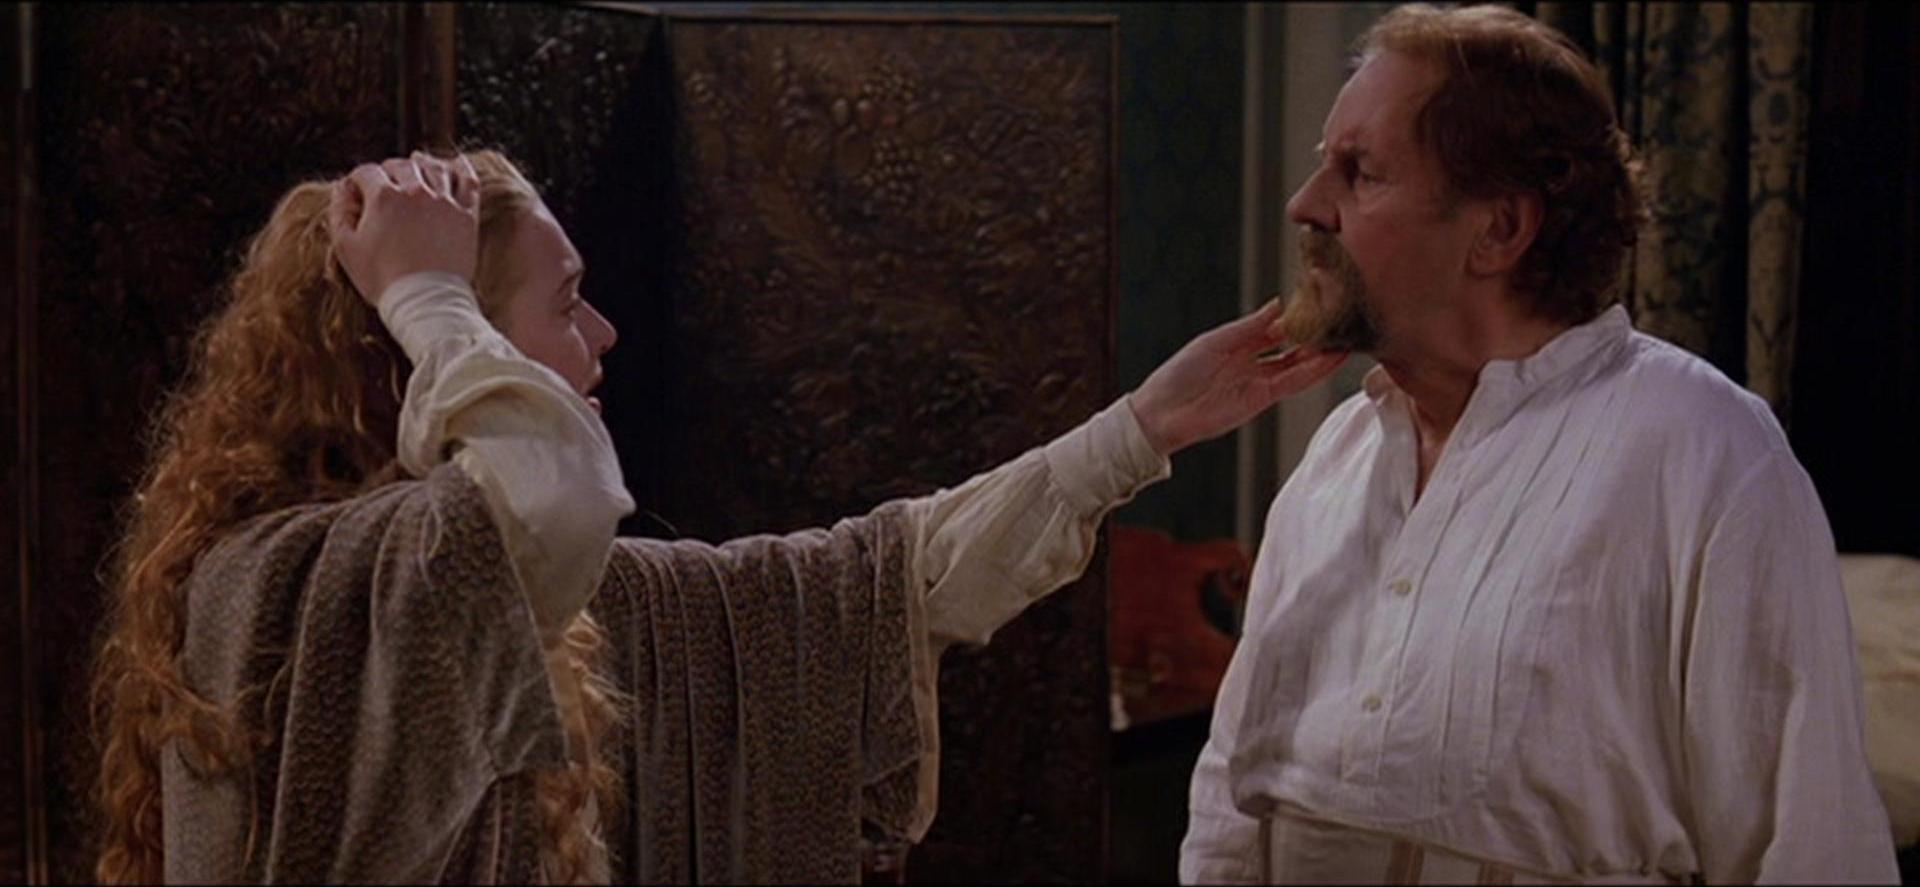 Ophelia Hamlet: Terrifying Ophelia